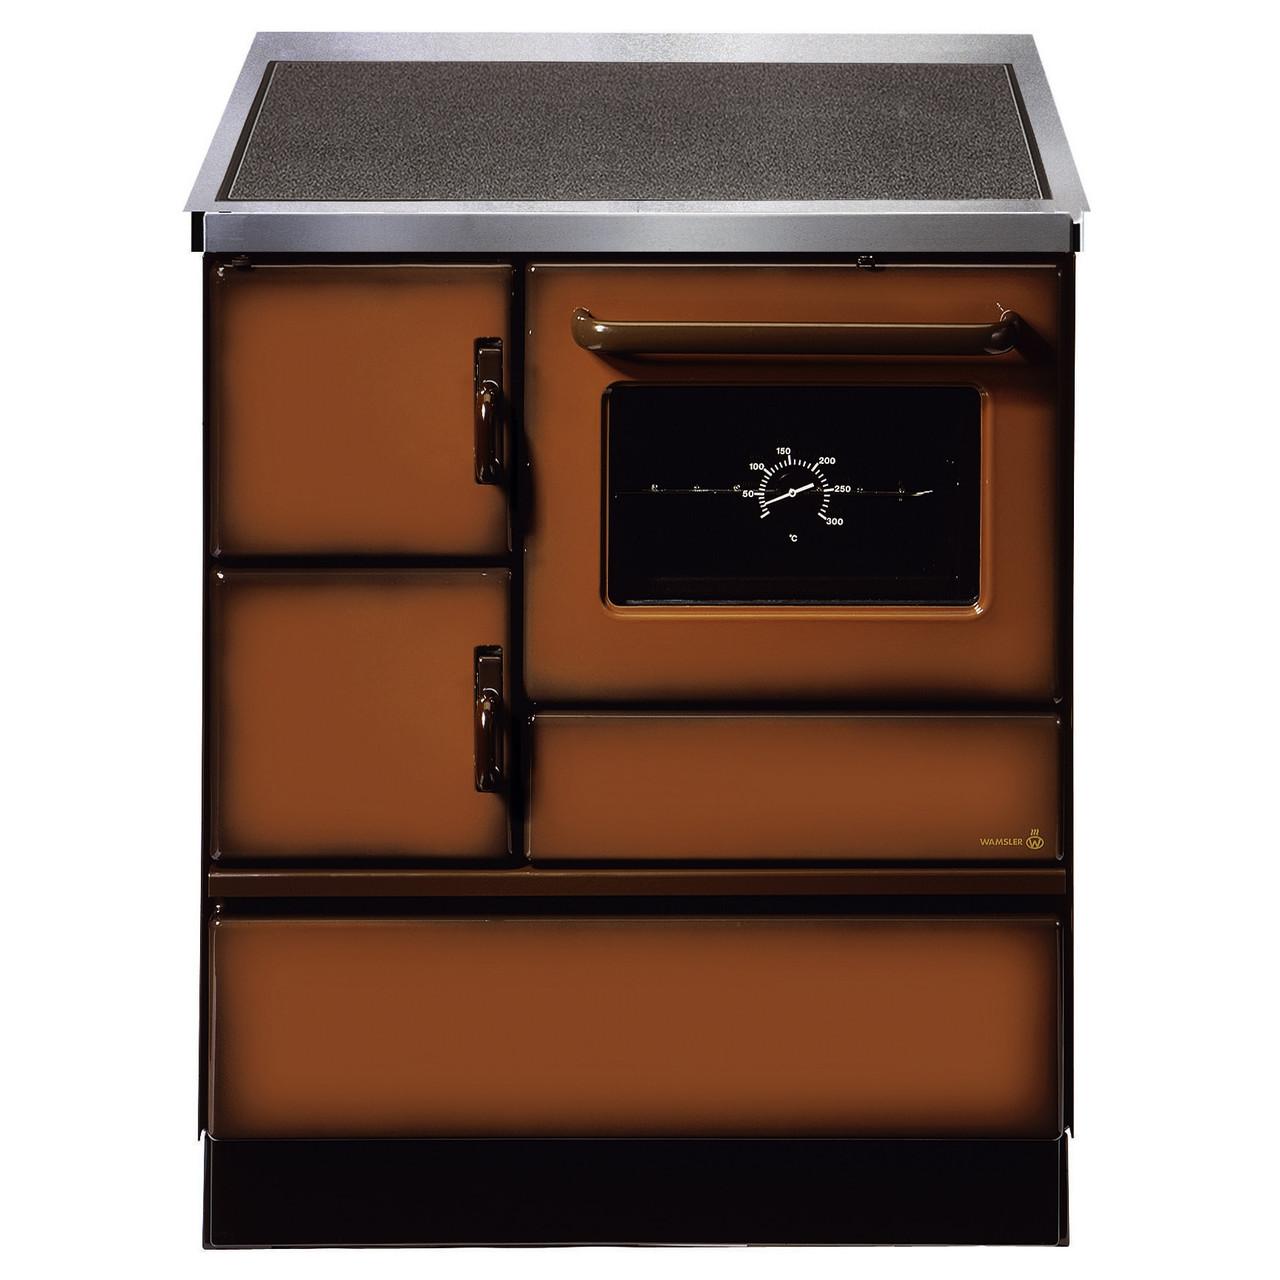 Плита Wamsler K128 C maron (коричневая)